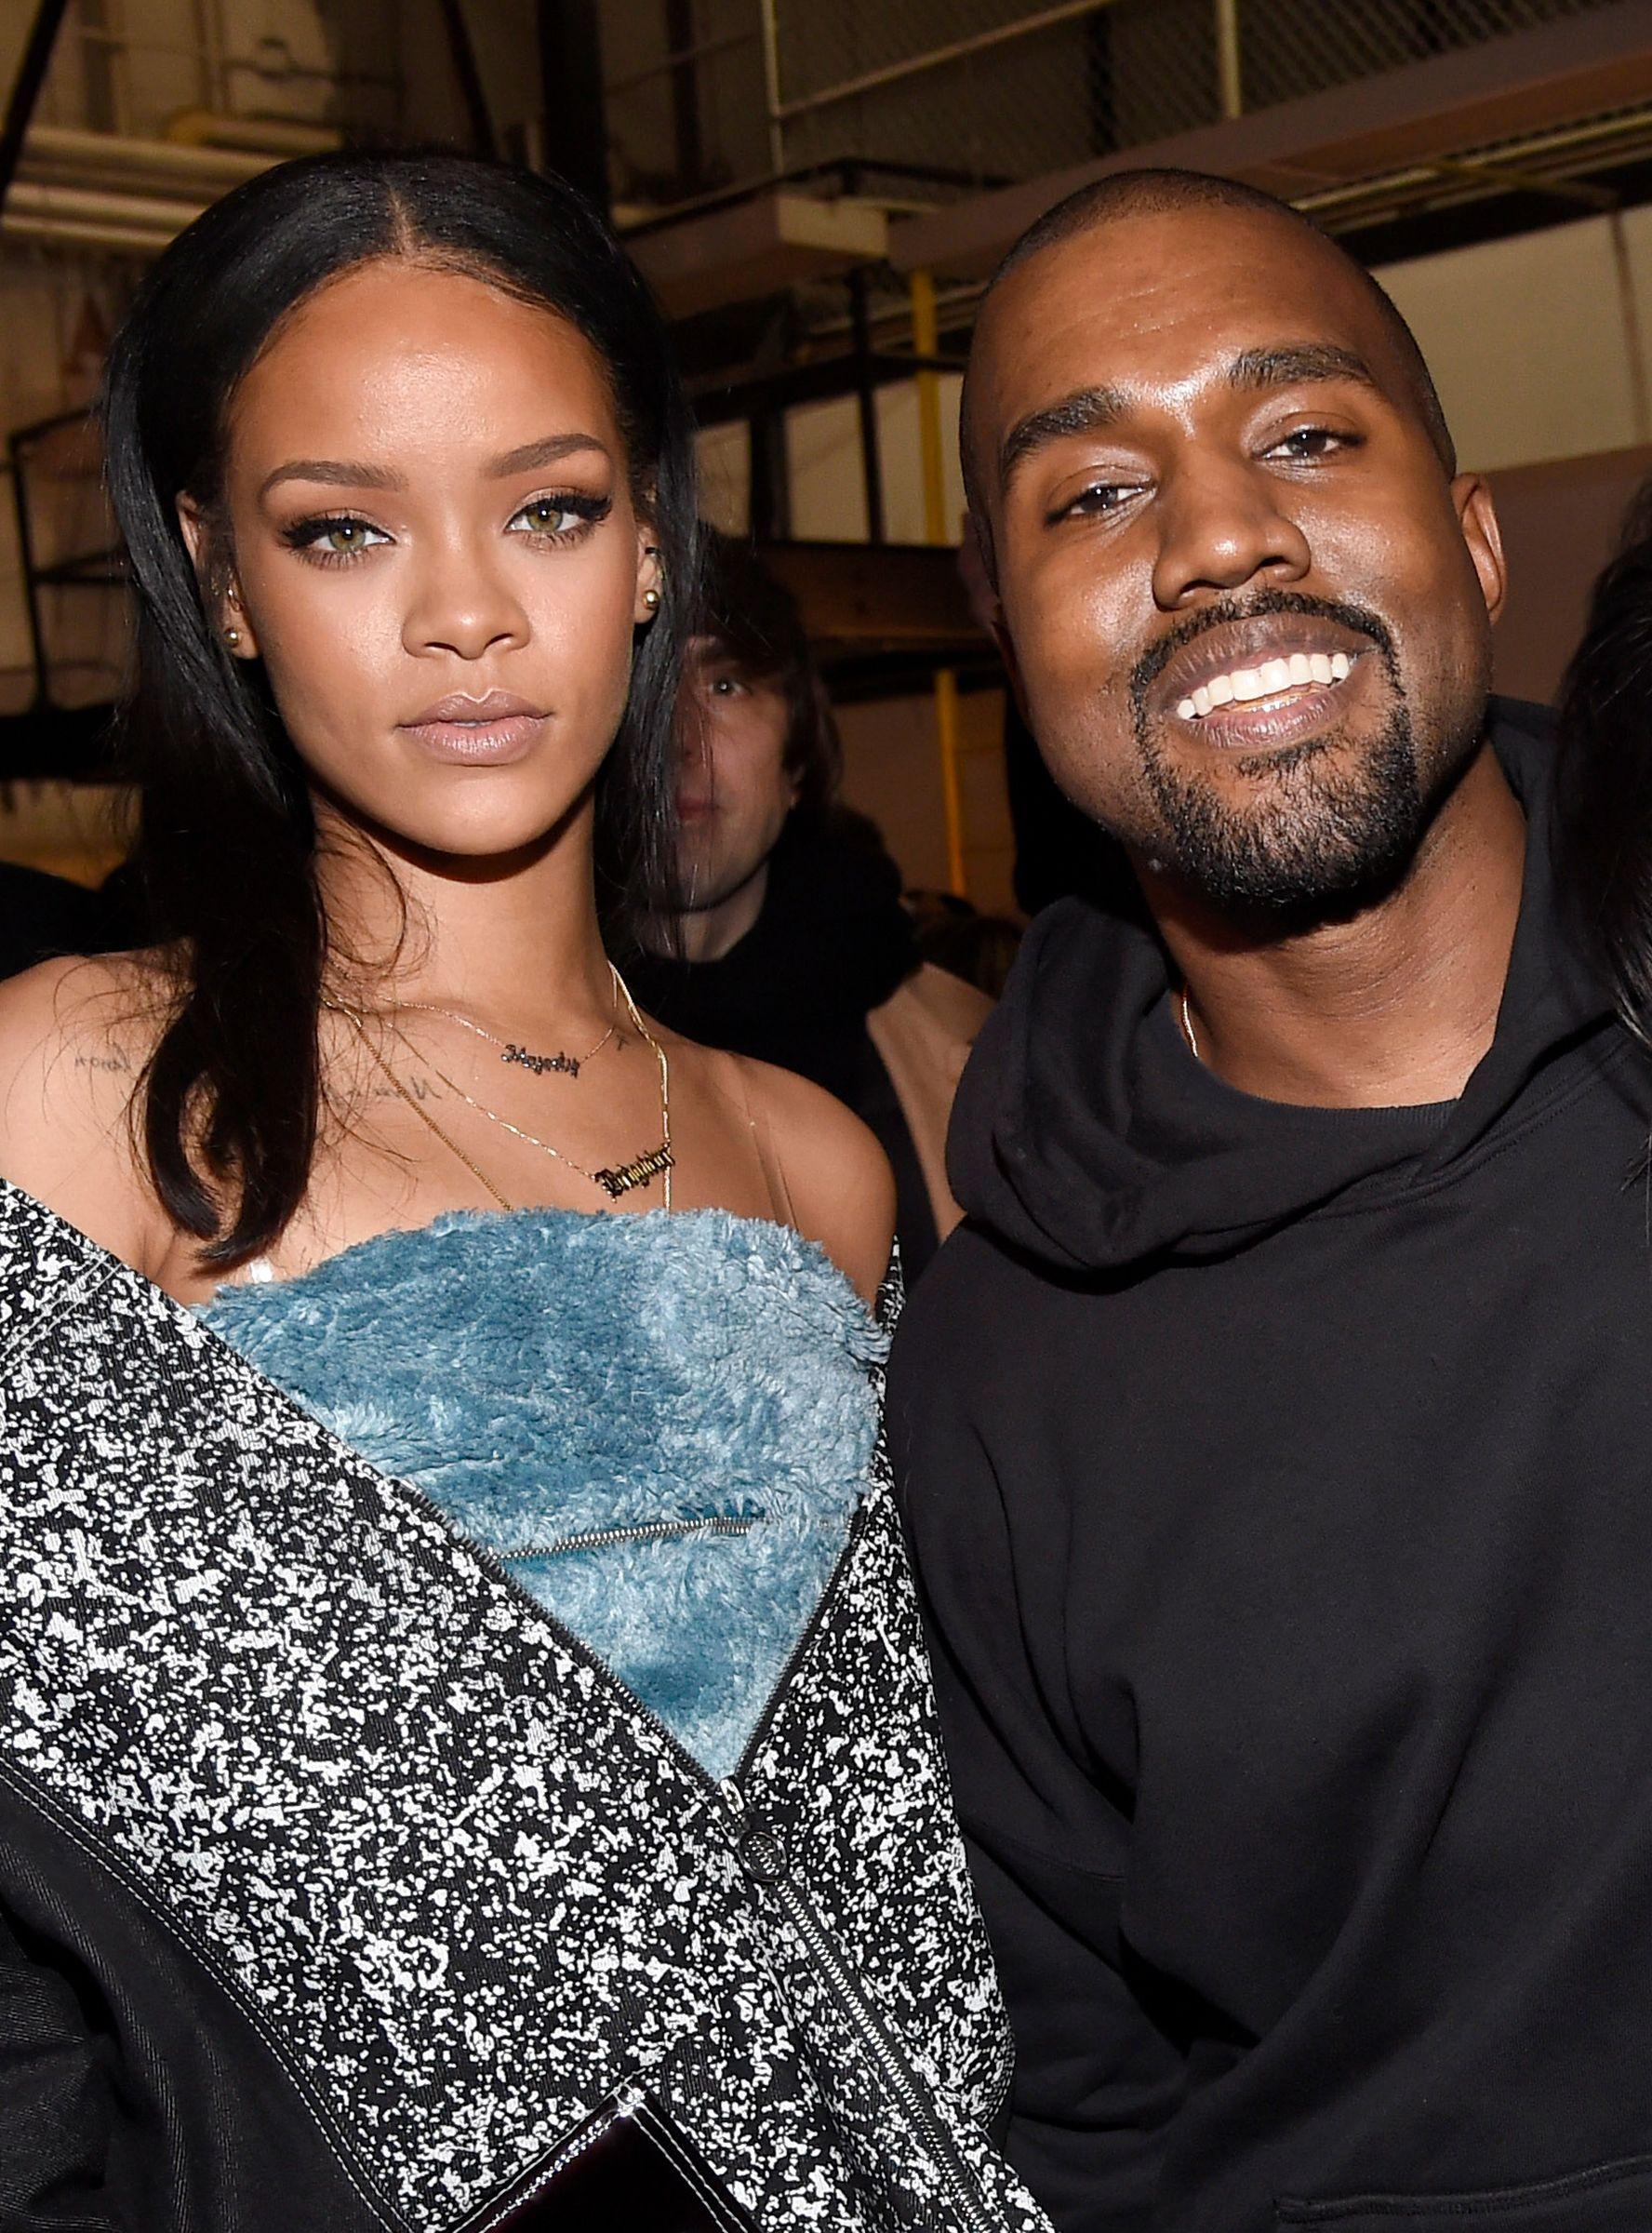 Rihanna Drake More Unfollow Kanye West After His Maga Tweets Https R29 Co 2i2jv1y Rihanna And Drake Kanye West Smiling Rihanna